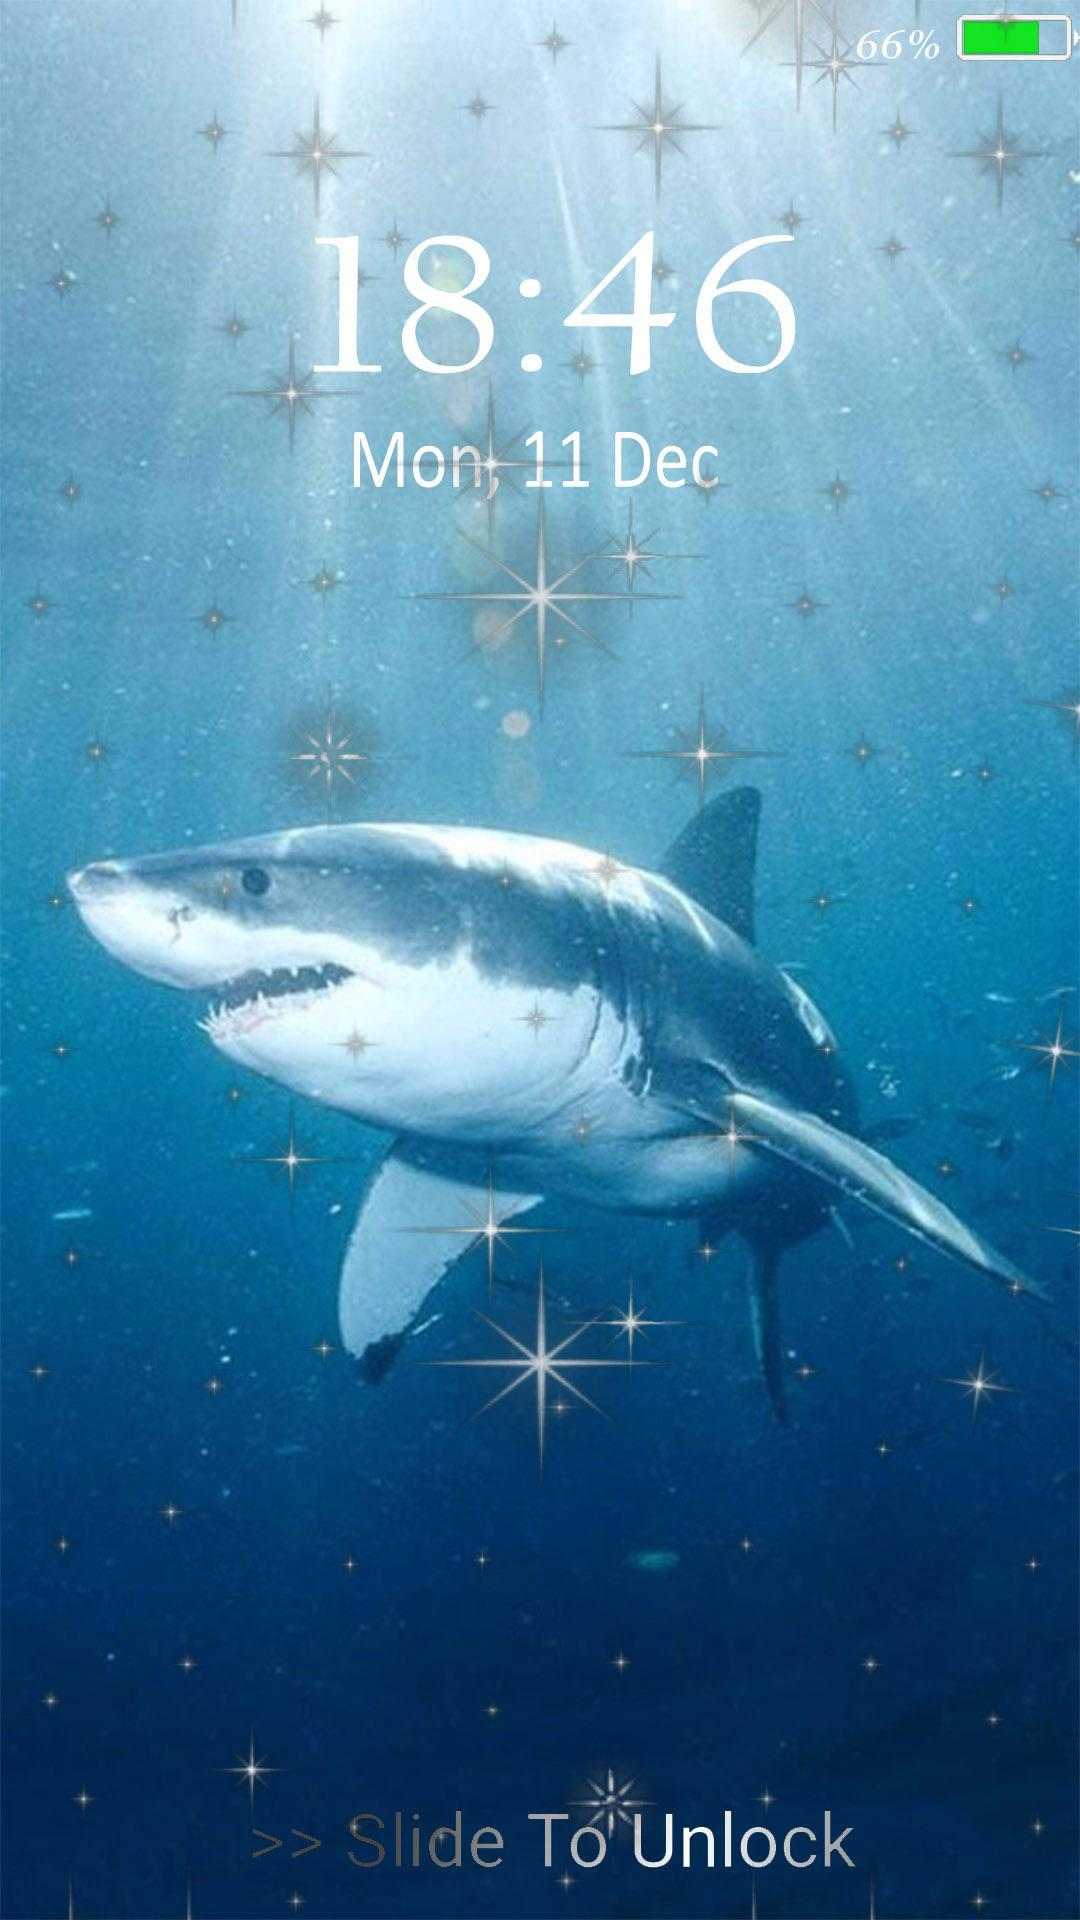 Tiger Sharks 3d Live Wallpaper For Android Apk Download